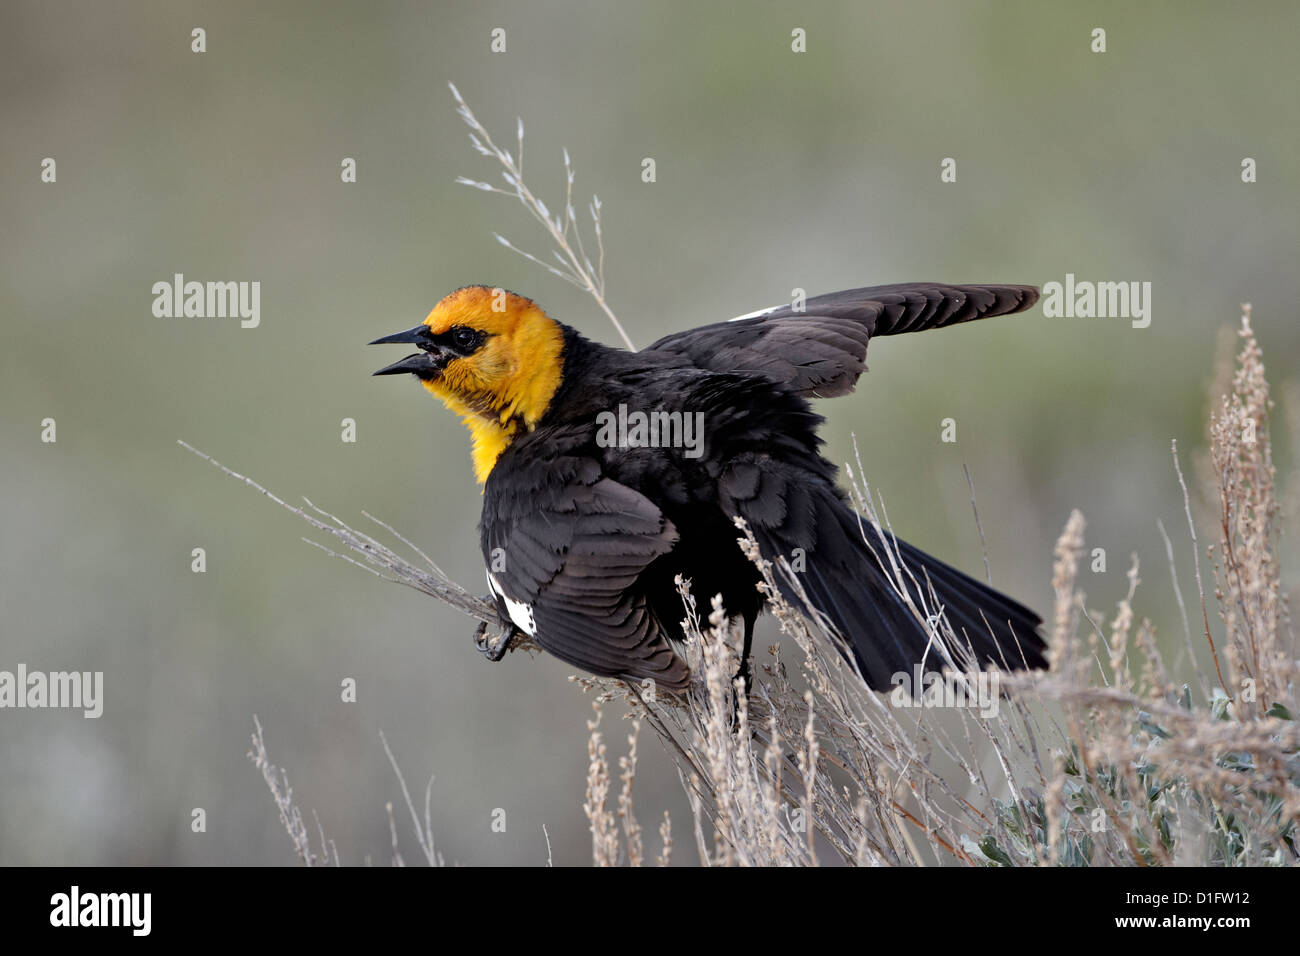 Male yellow-headed blackbird (Xanthocephalus xanthocephalus) dislaying, Yellowstone National Park, Wyoming, USA - Stock Image